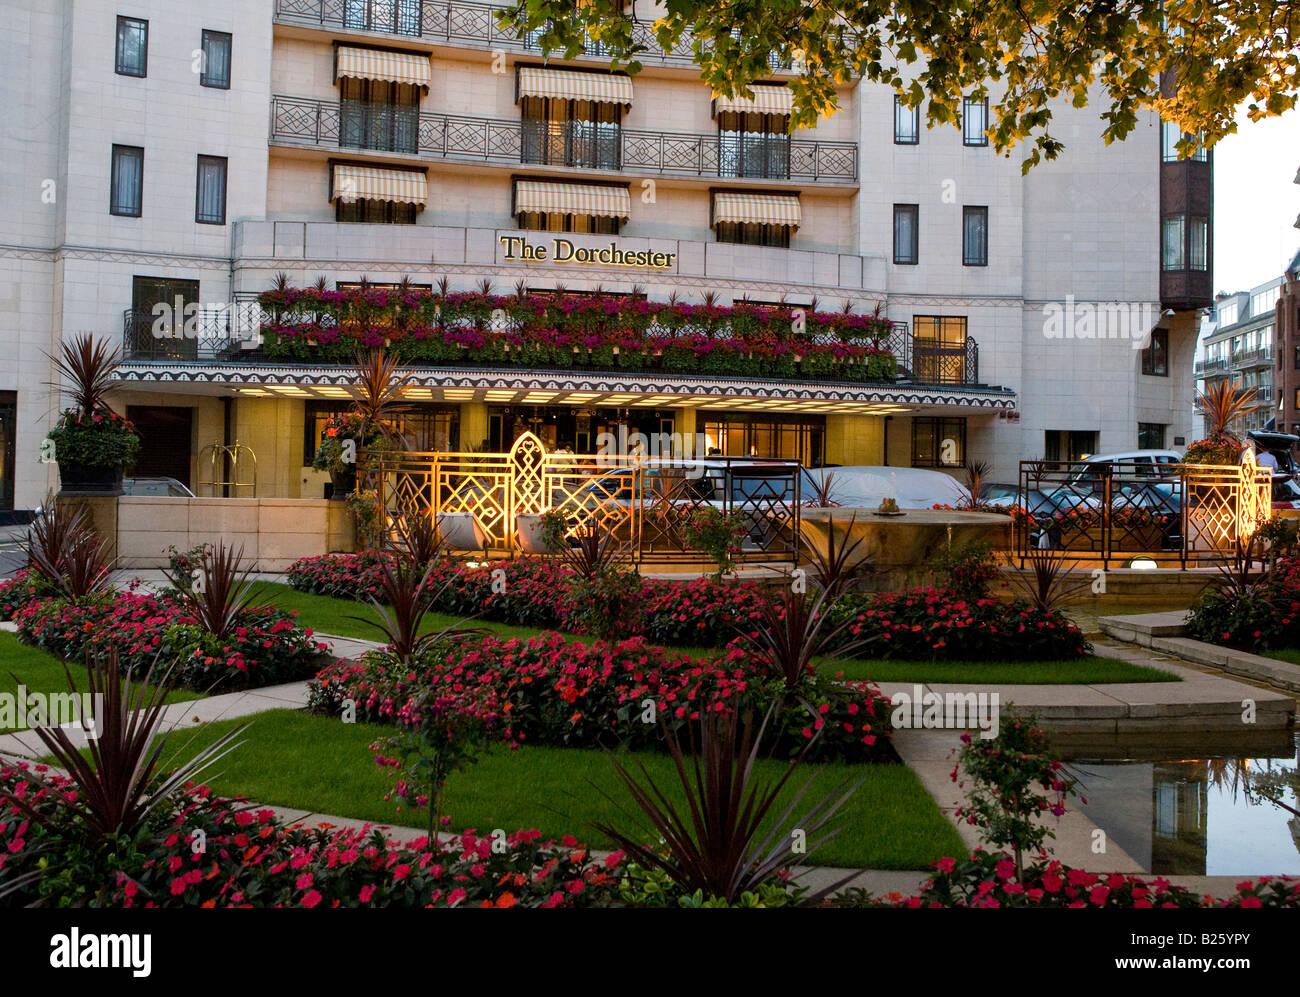 The Dorchester Hotel Park Lane London UK Europe - Stock Image